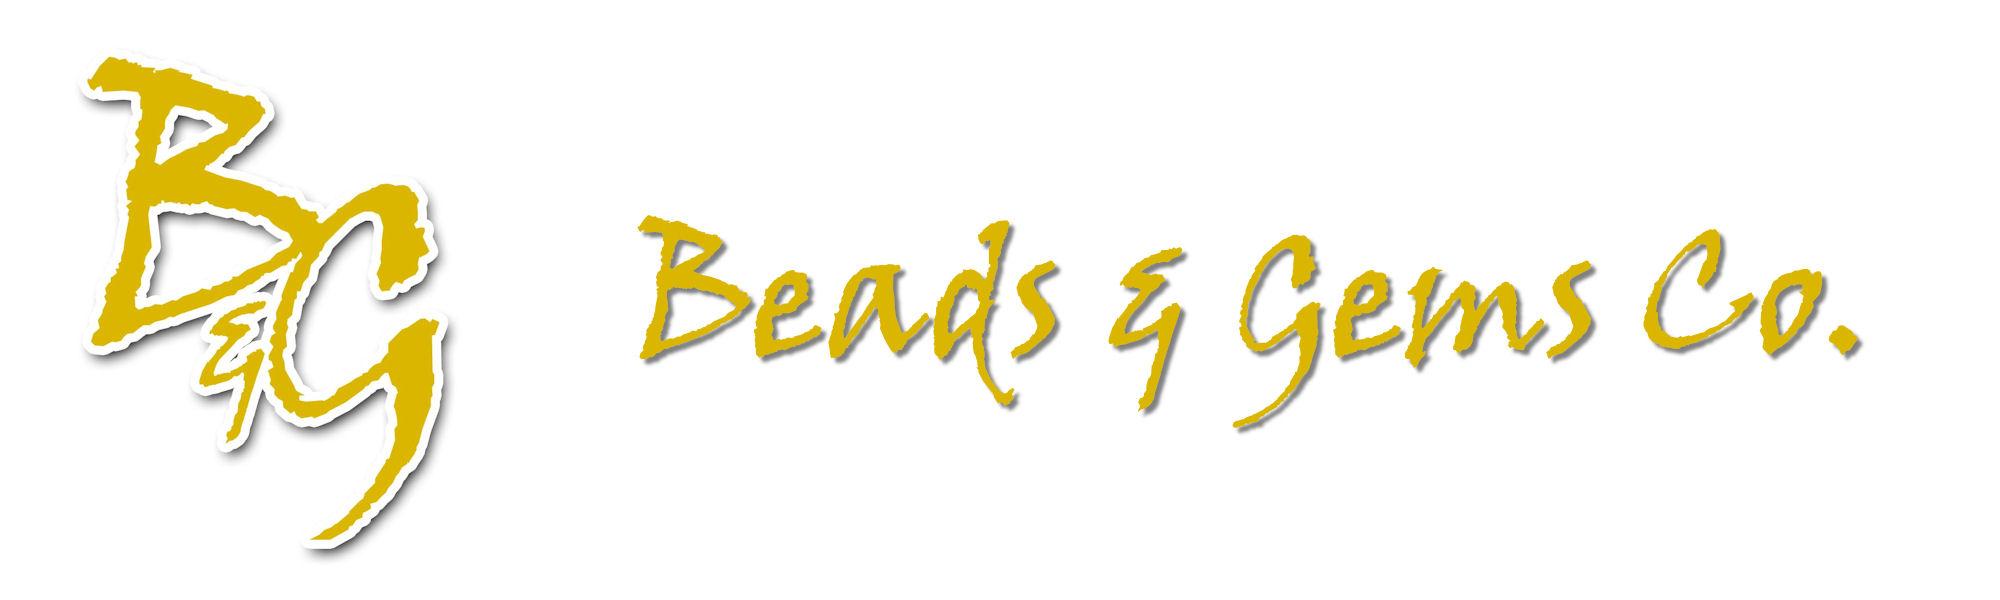 Beads & Gems ( Brackenfell )